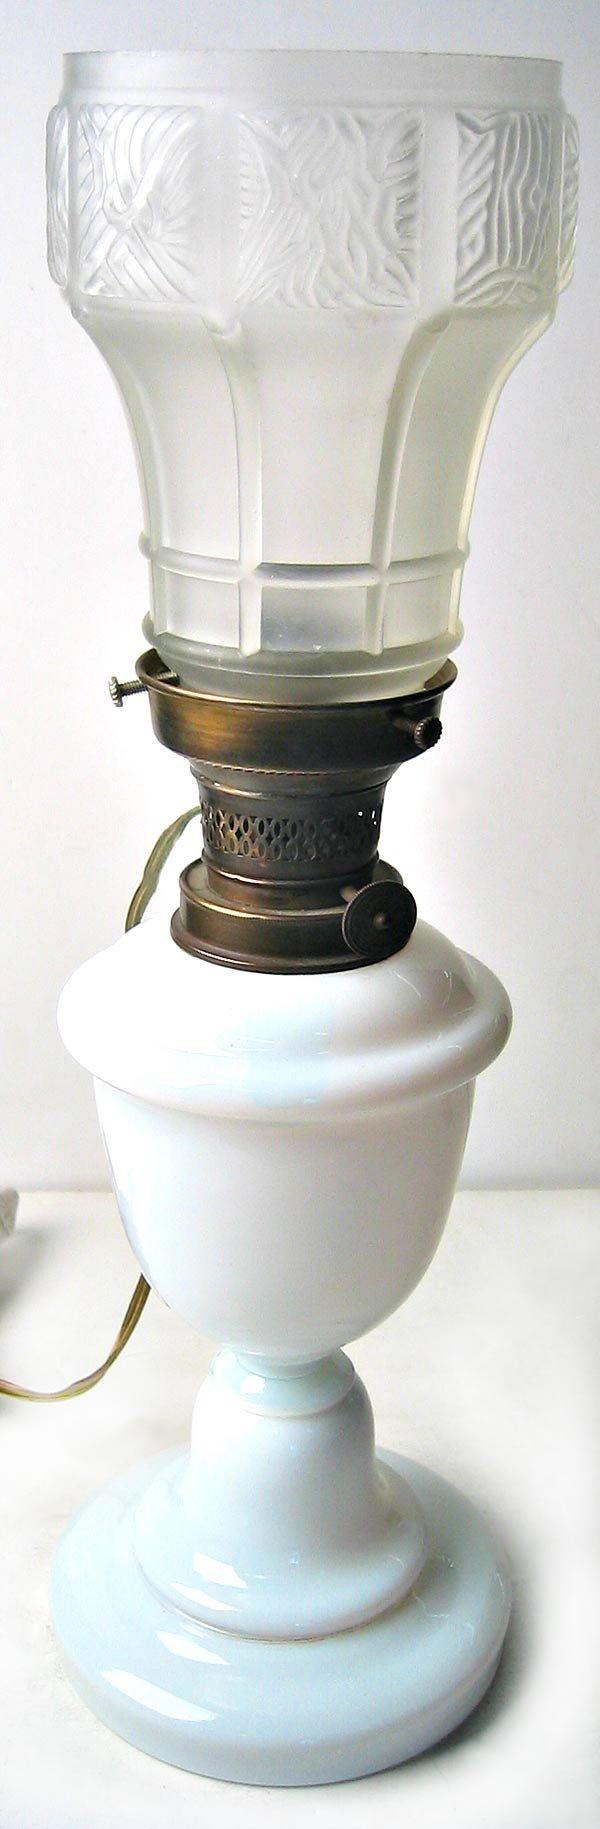 6973: Milk glass table lamp